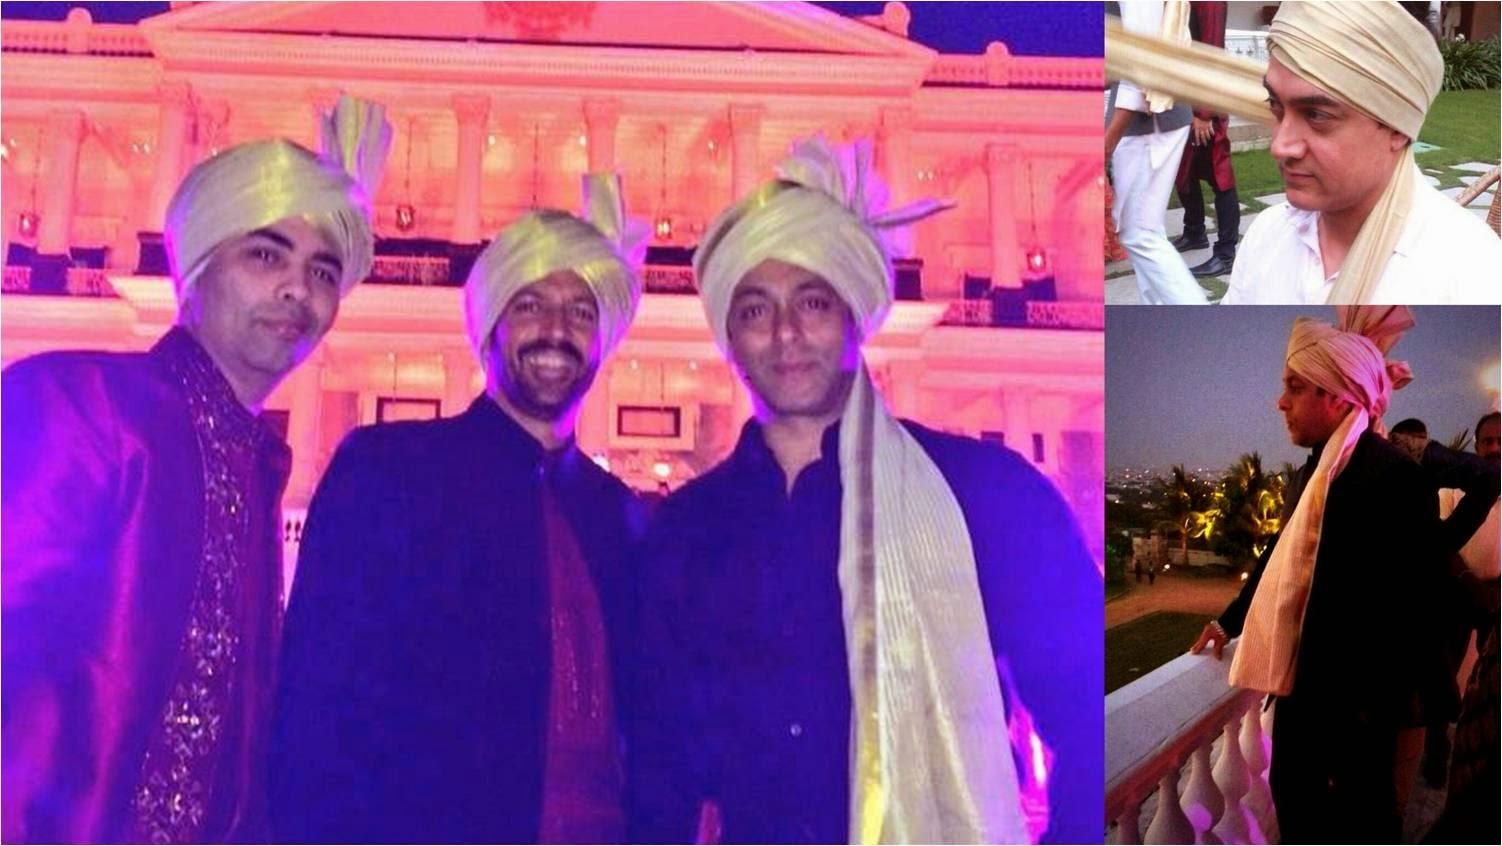 Karan, Salman and Aamir in safa